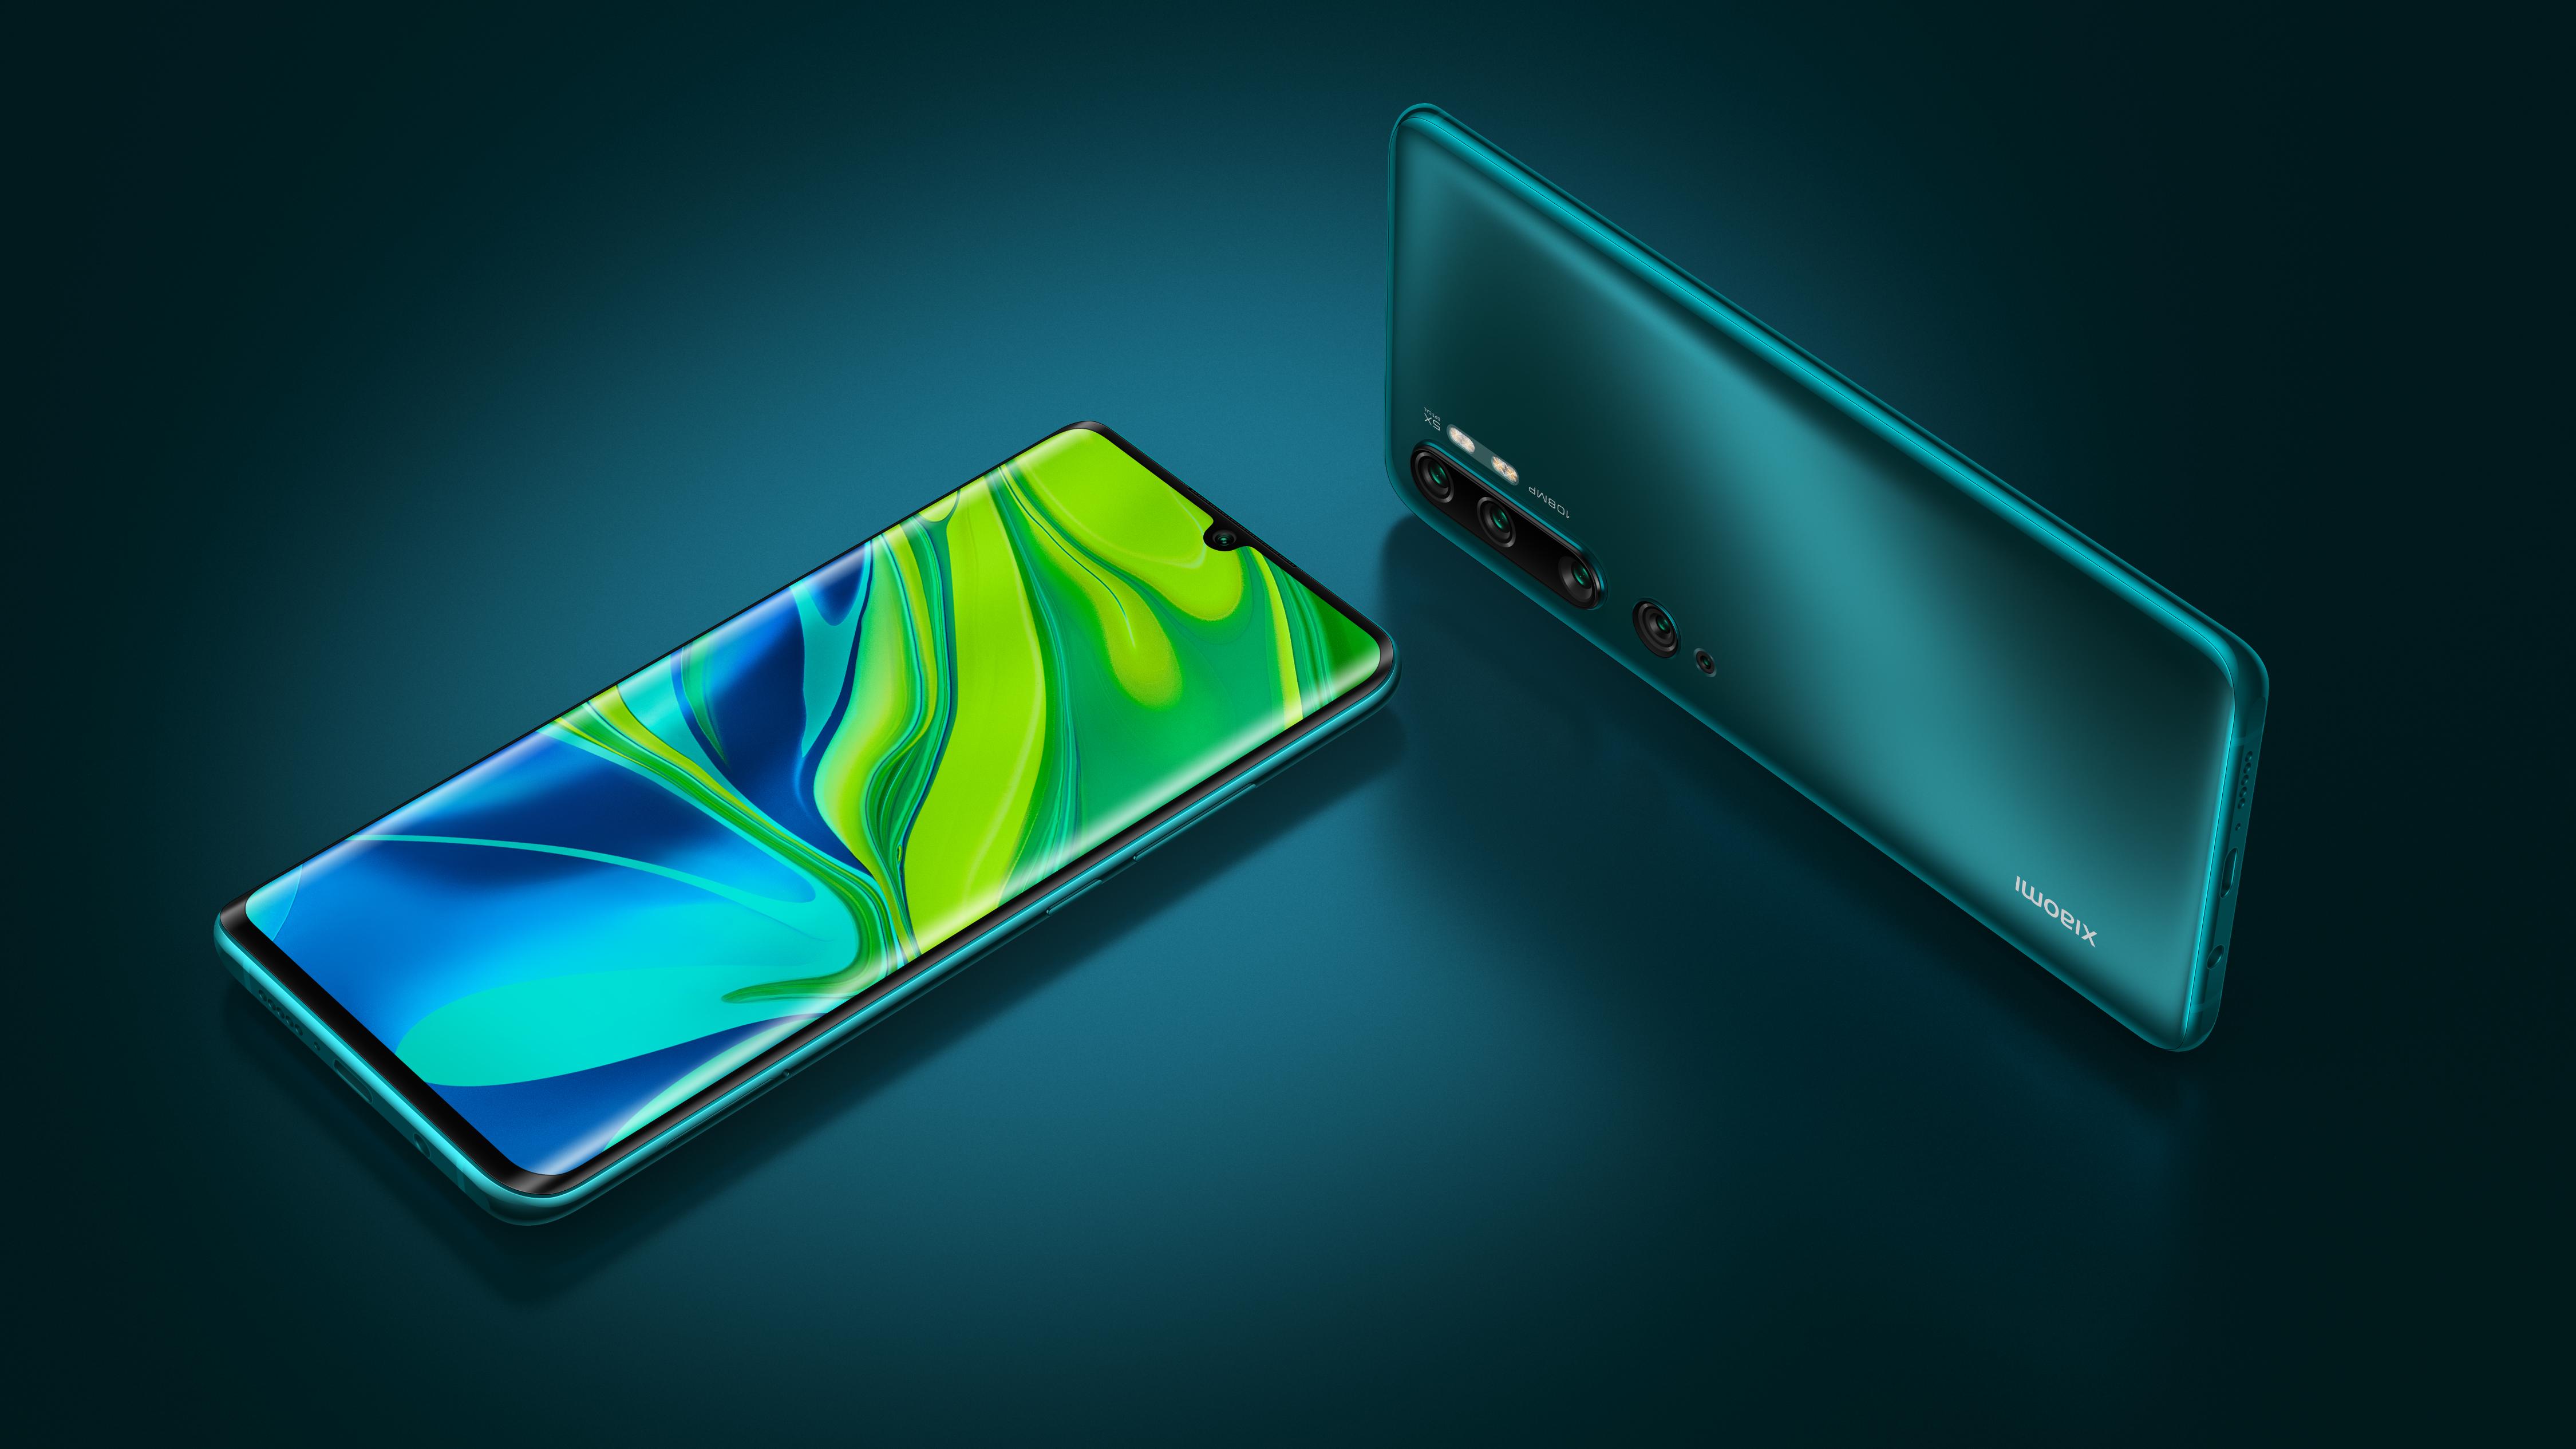 Xiaomi Mi 10, 10 Pro dan Xiaomi Mi 10T Pro akan memiliki prosesor Snapdragon 865 1